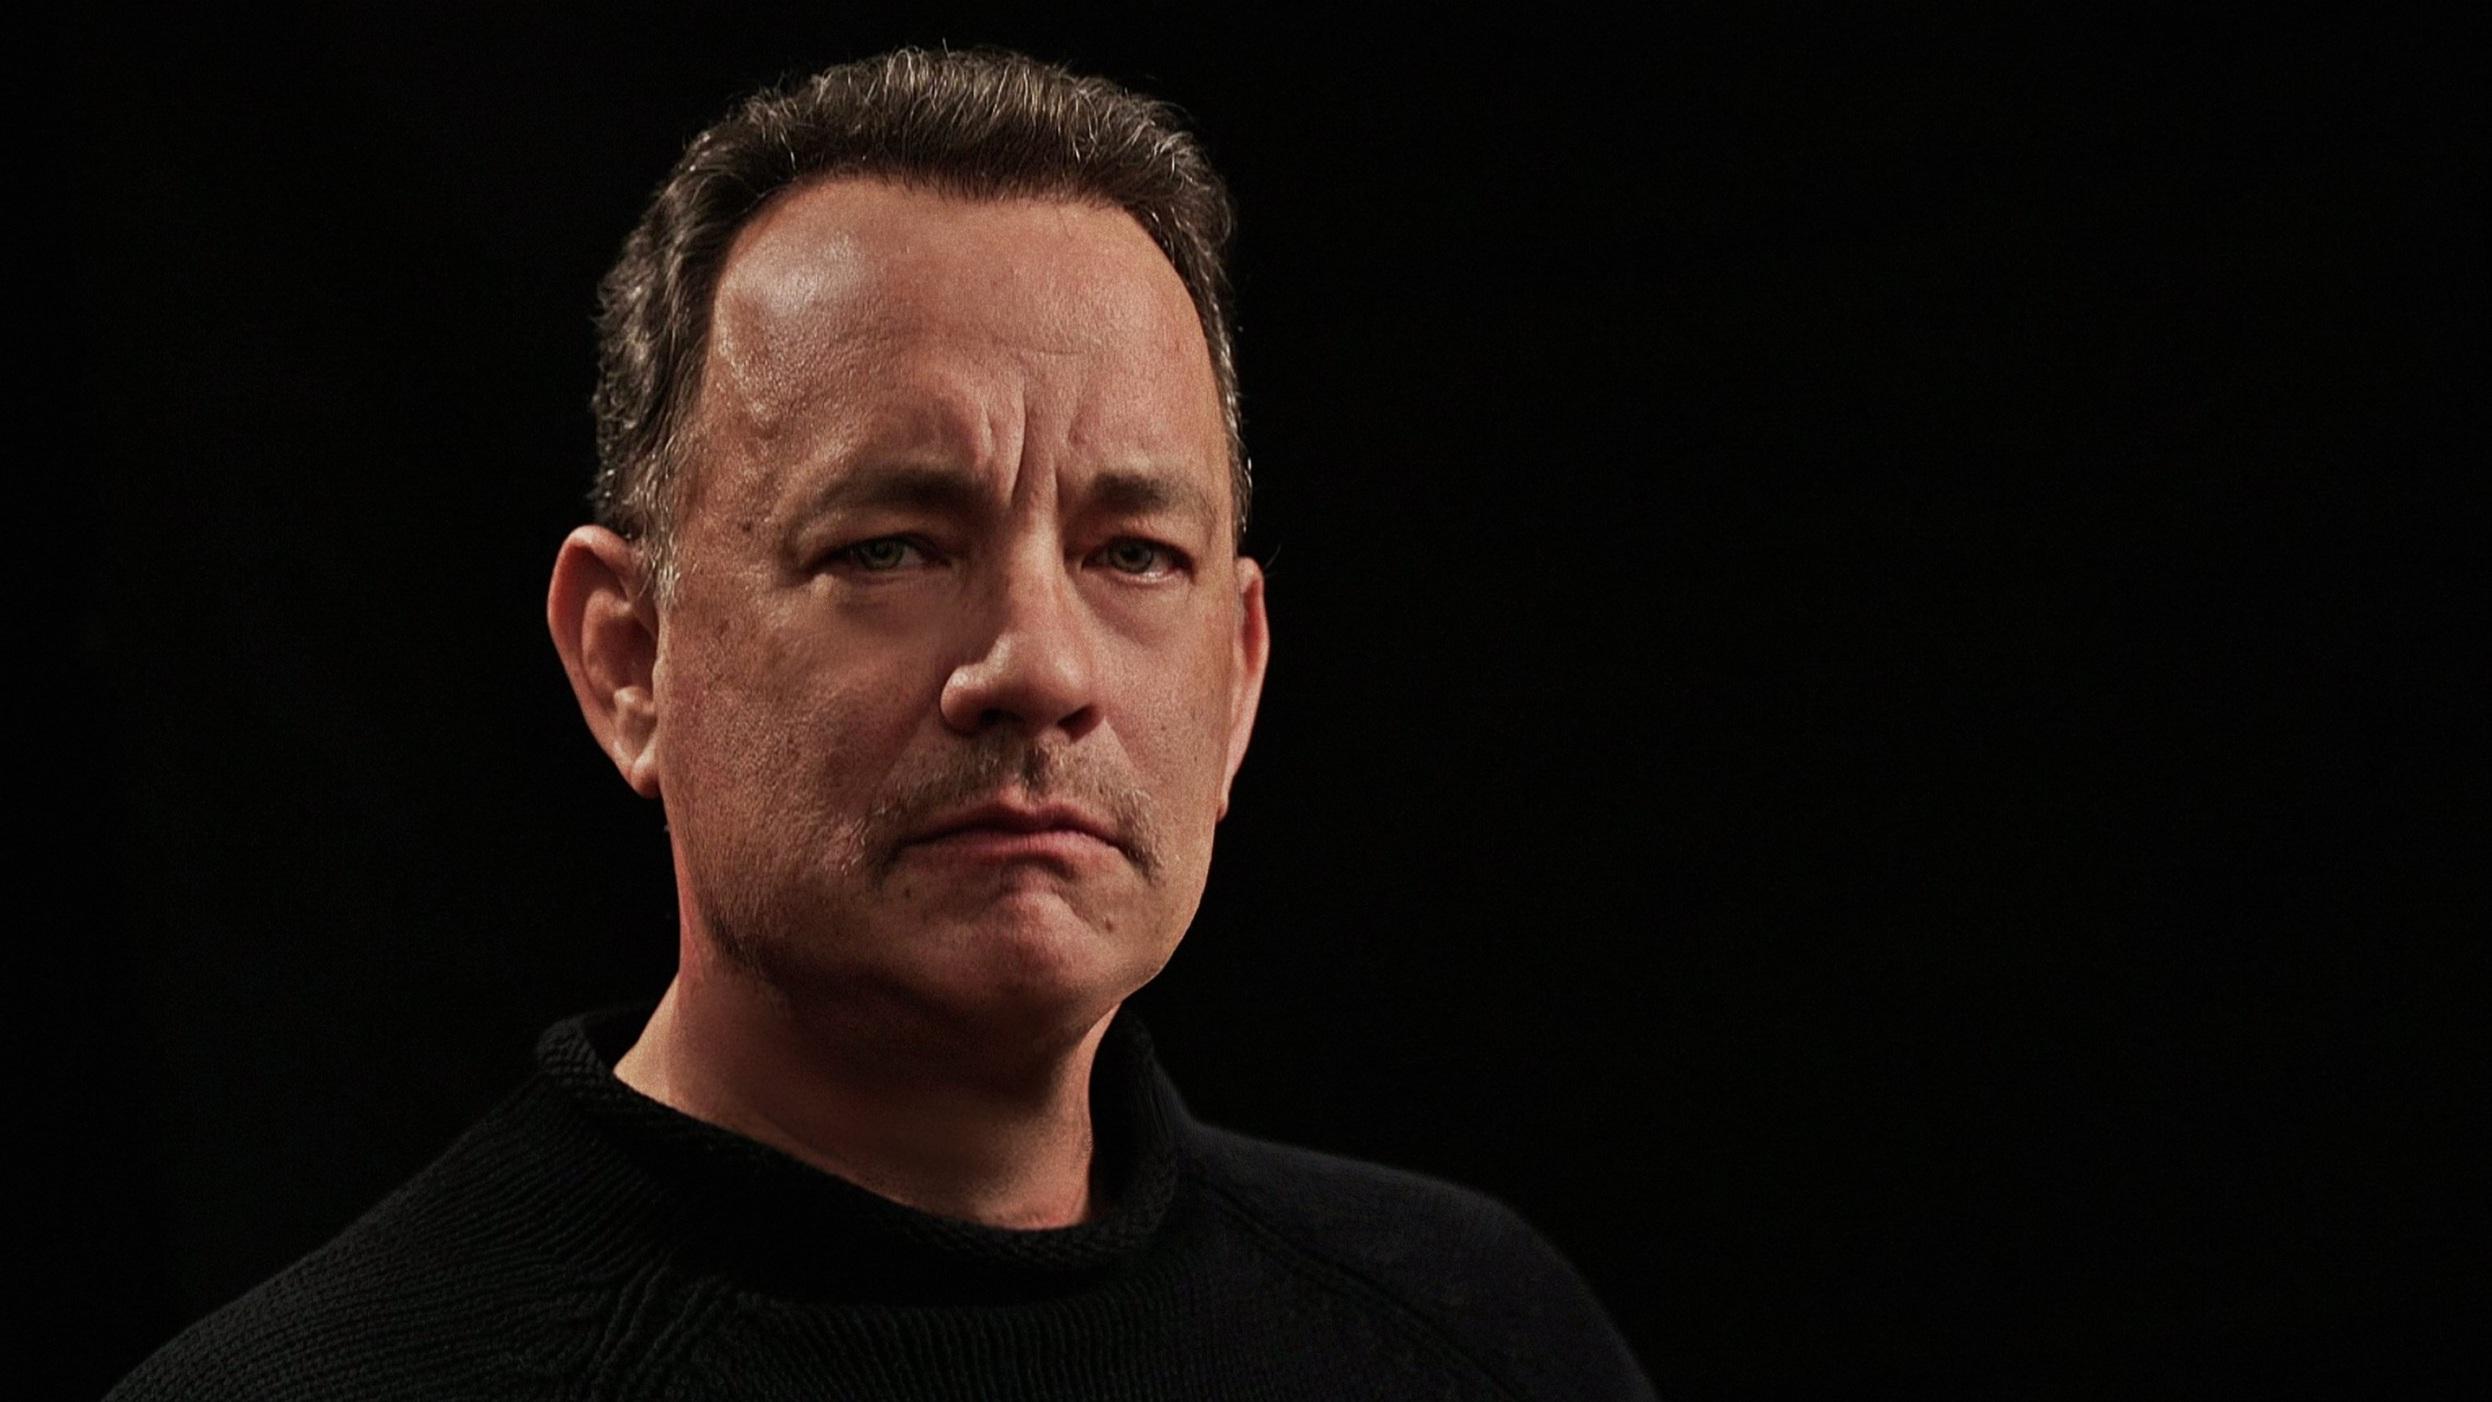 Hanks_Portrait_FINAL.jpg